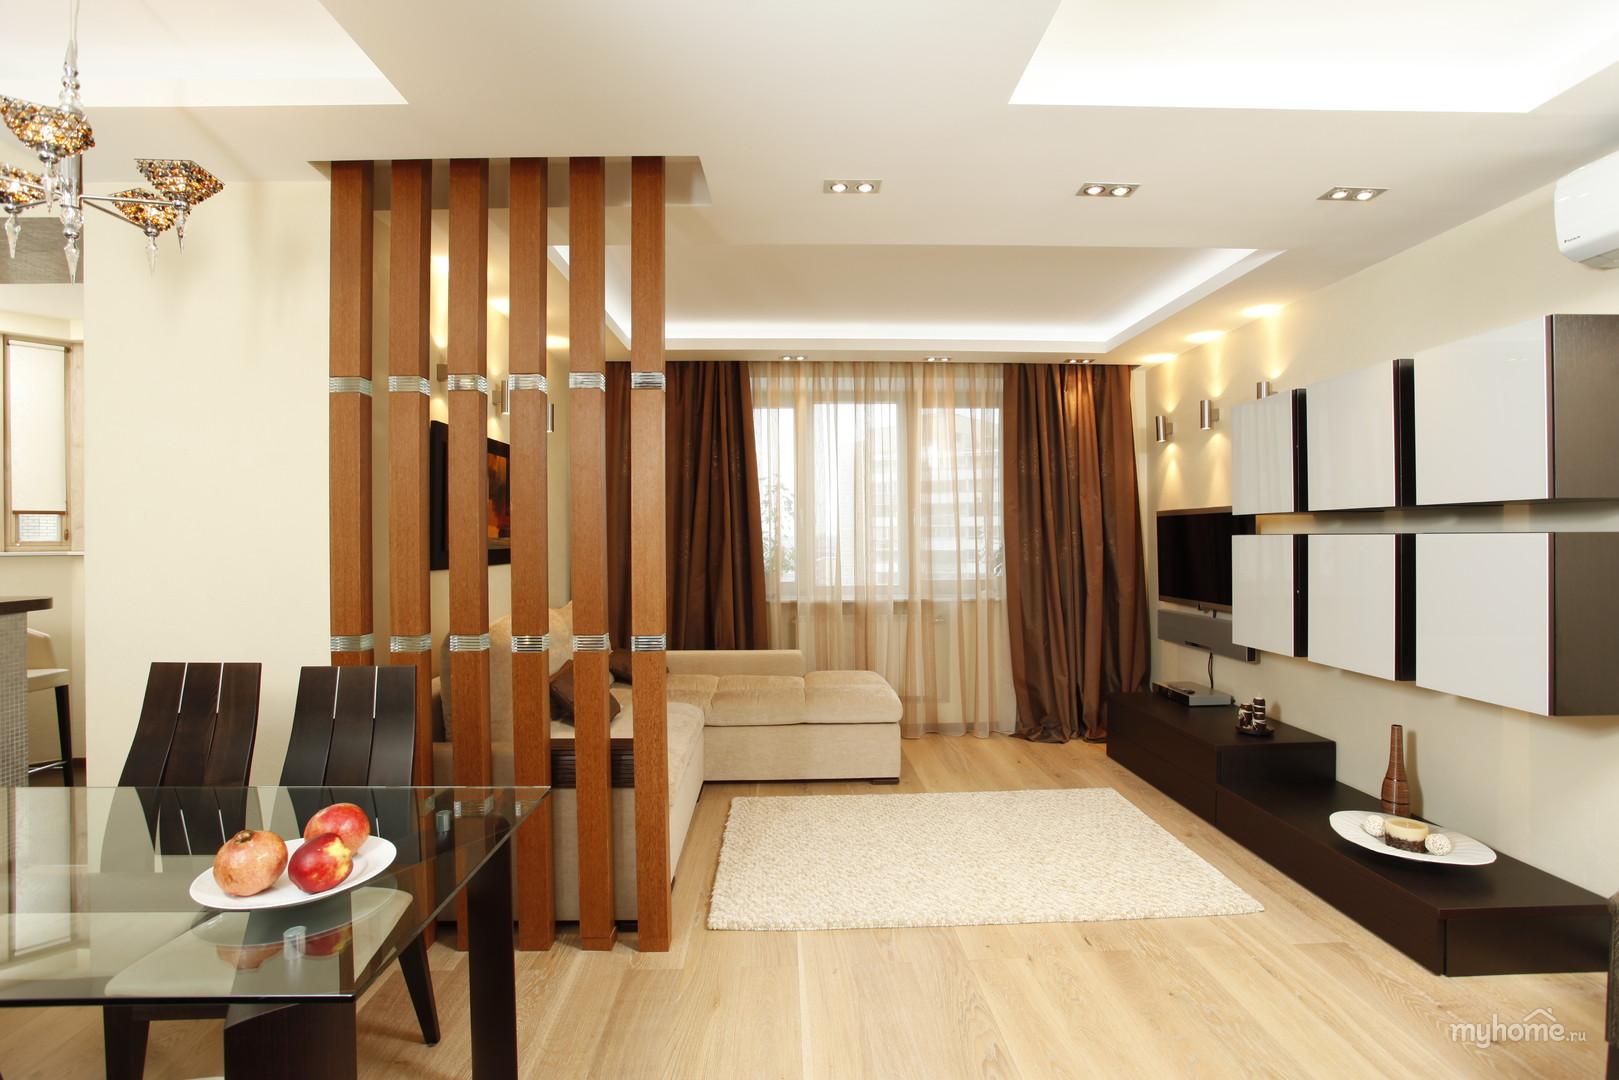 Декор в комнате